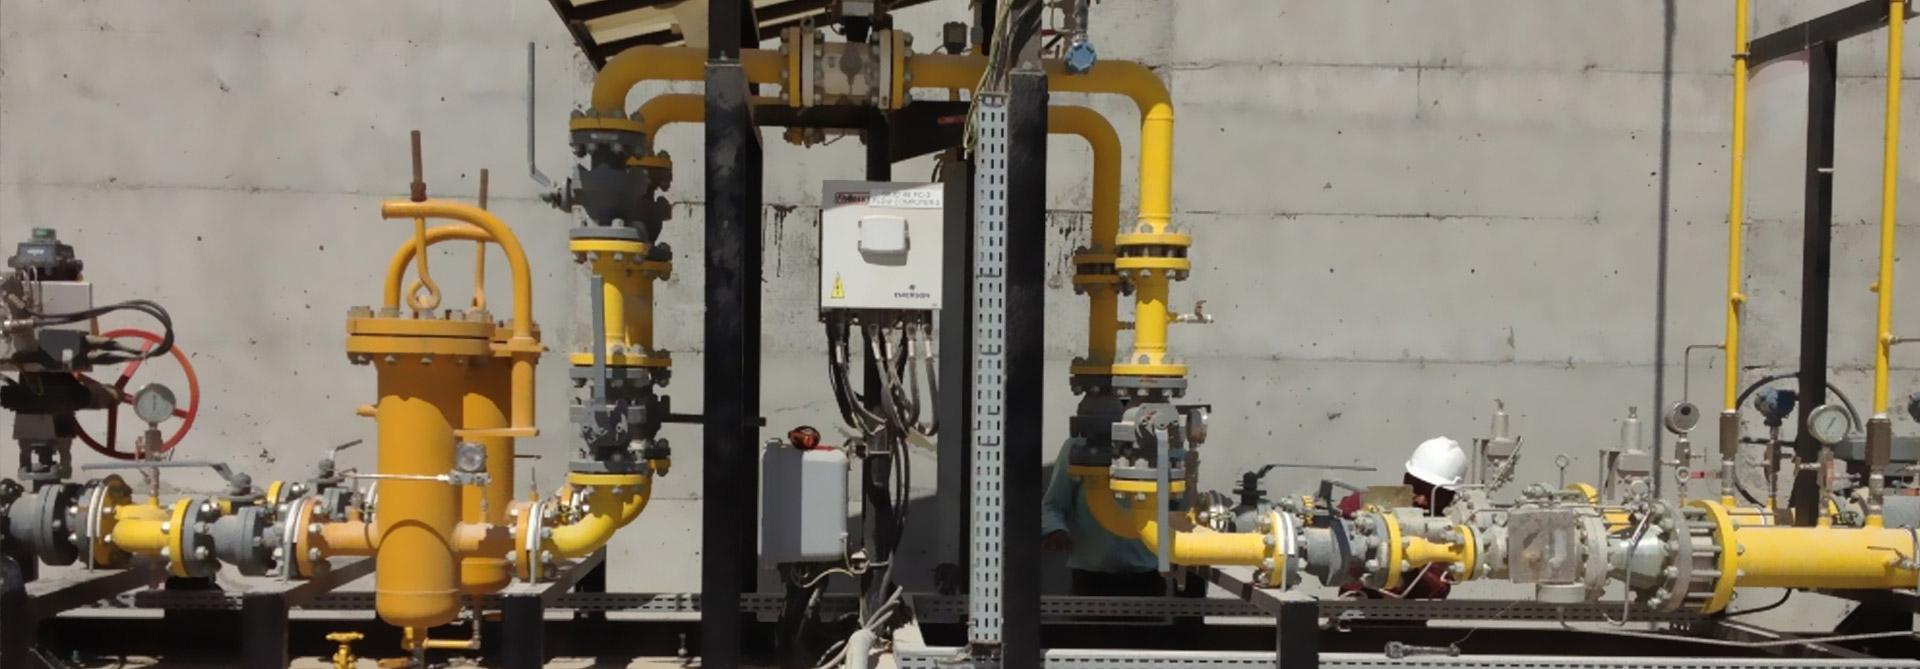 SECONDARY NATURAL GAS METERING & REGULATING SKID